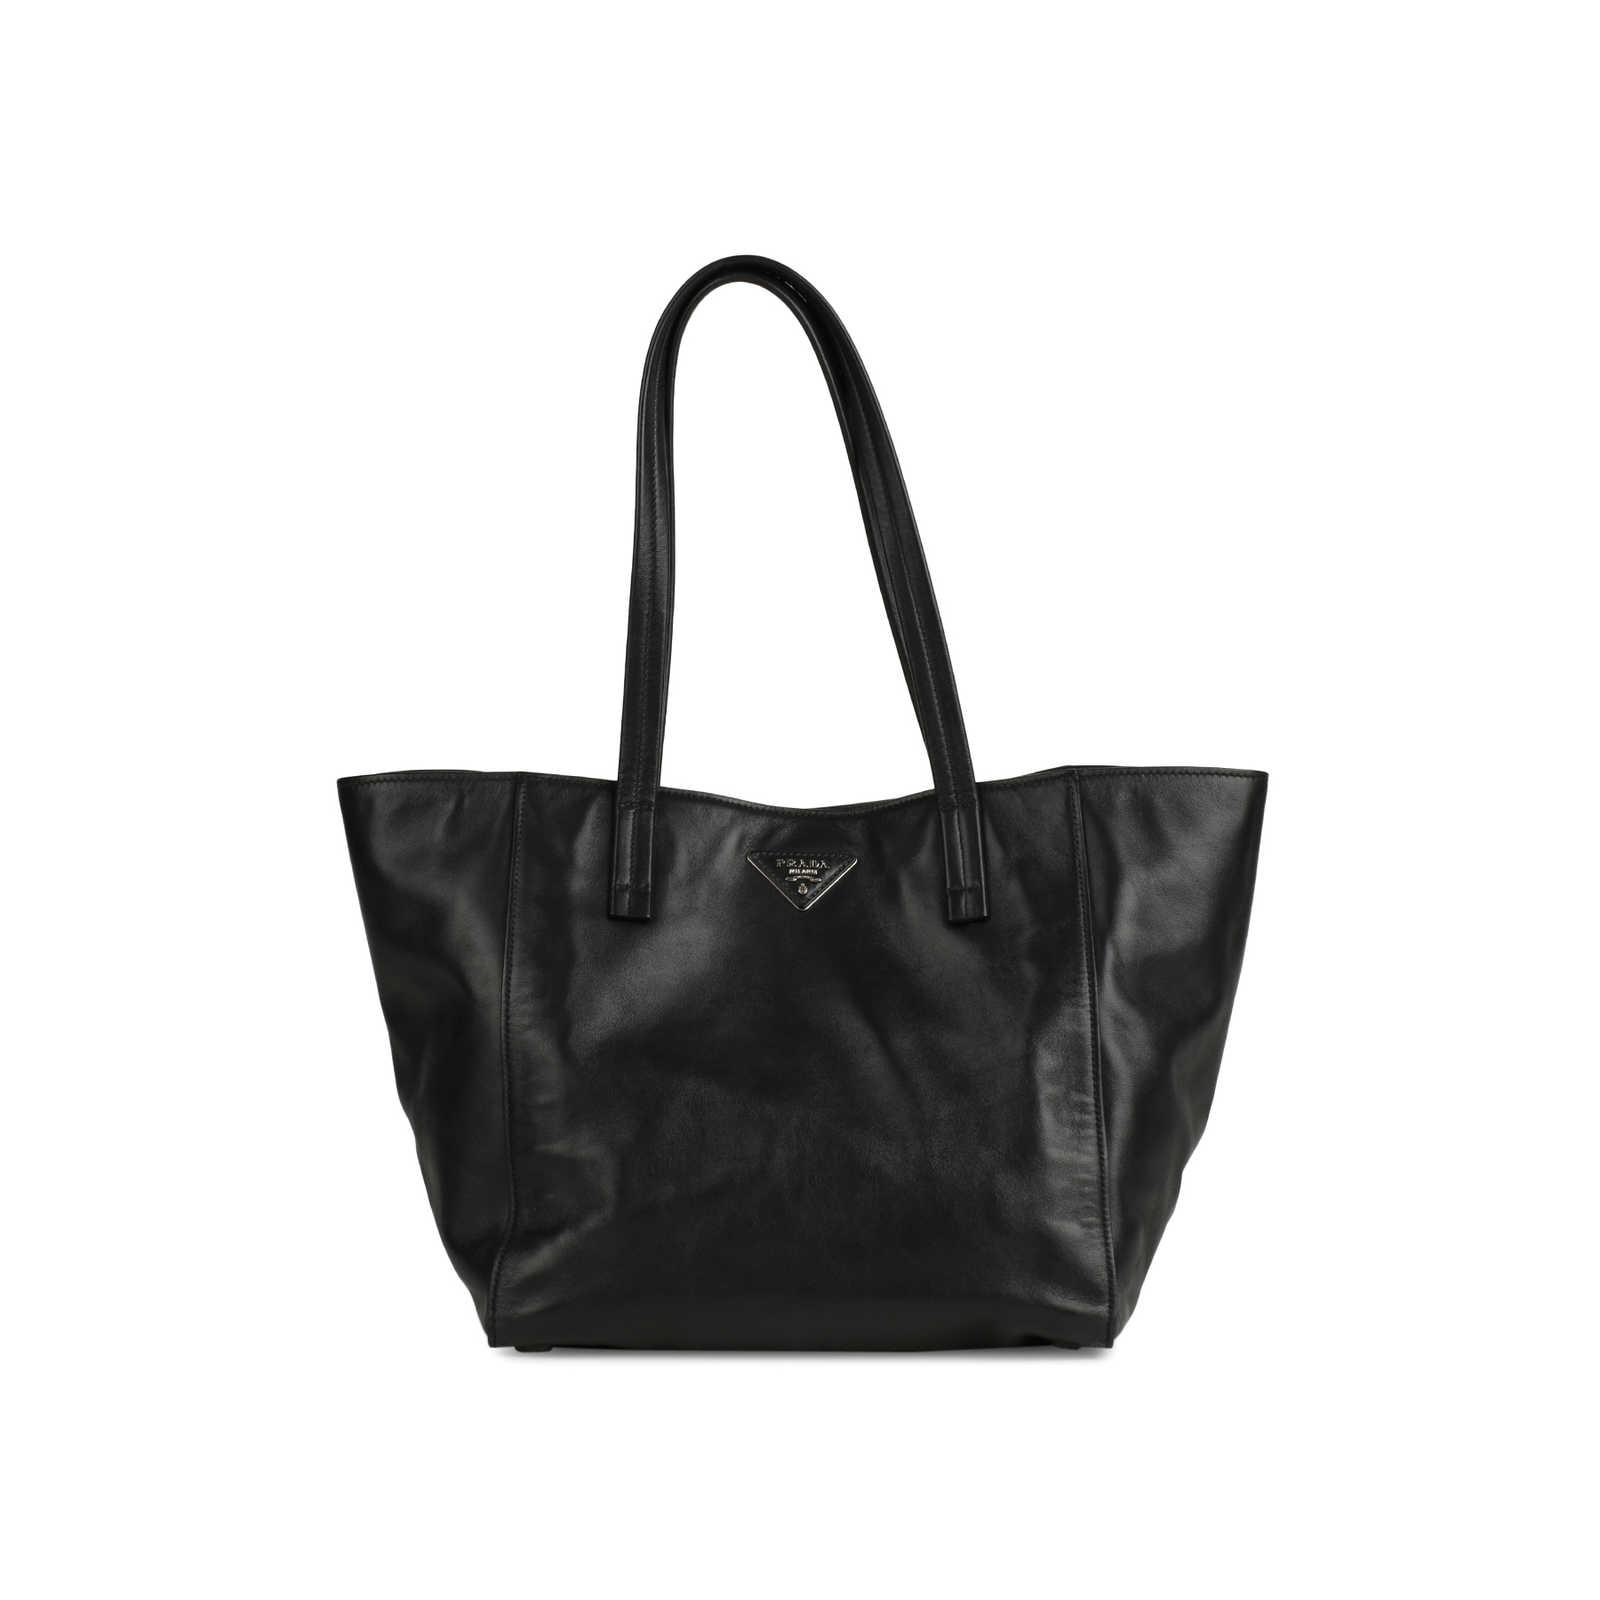 2366c5e0ba0f Authentic Second Hand Prada Soft Calf Skin Leather Tote Bag (PSS-145-00159  ...